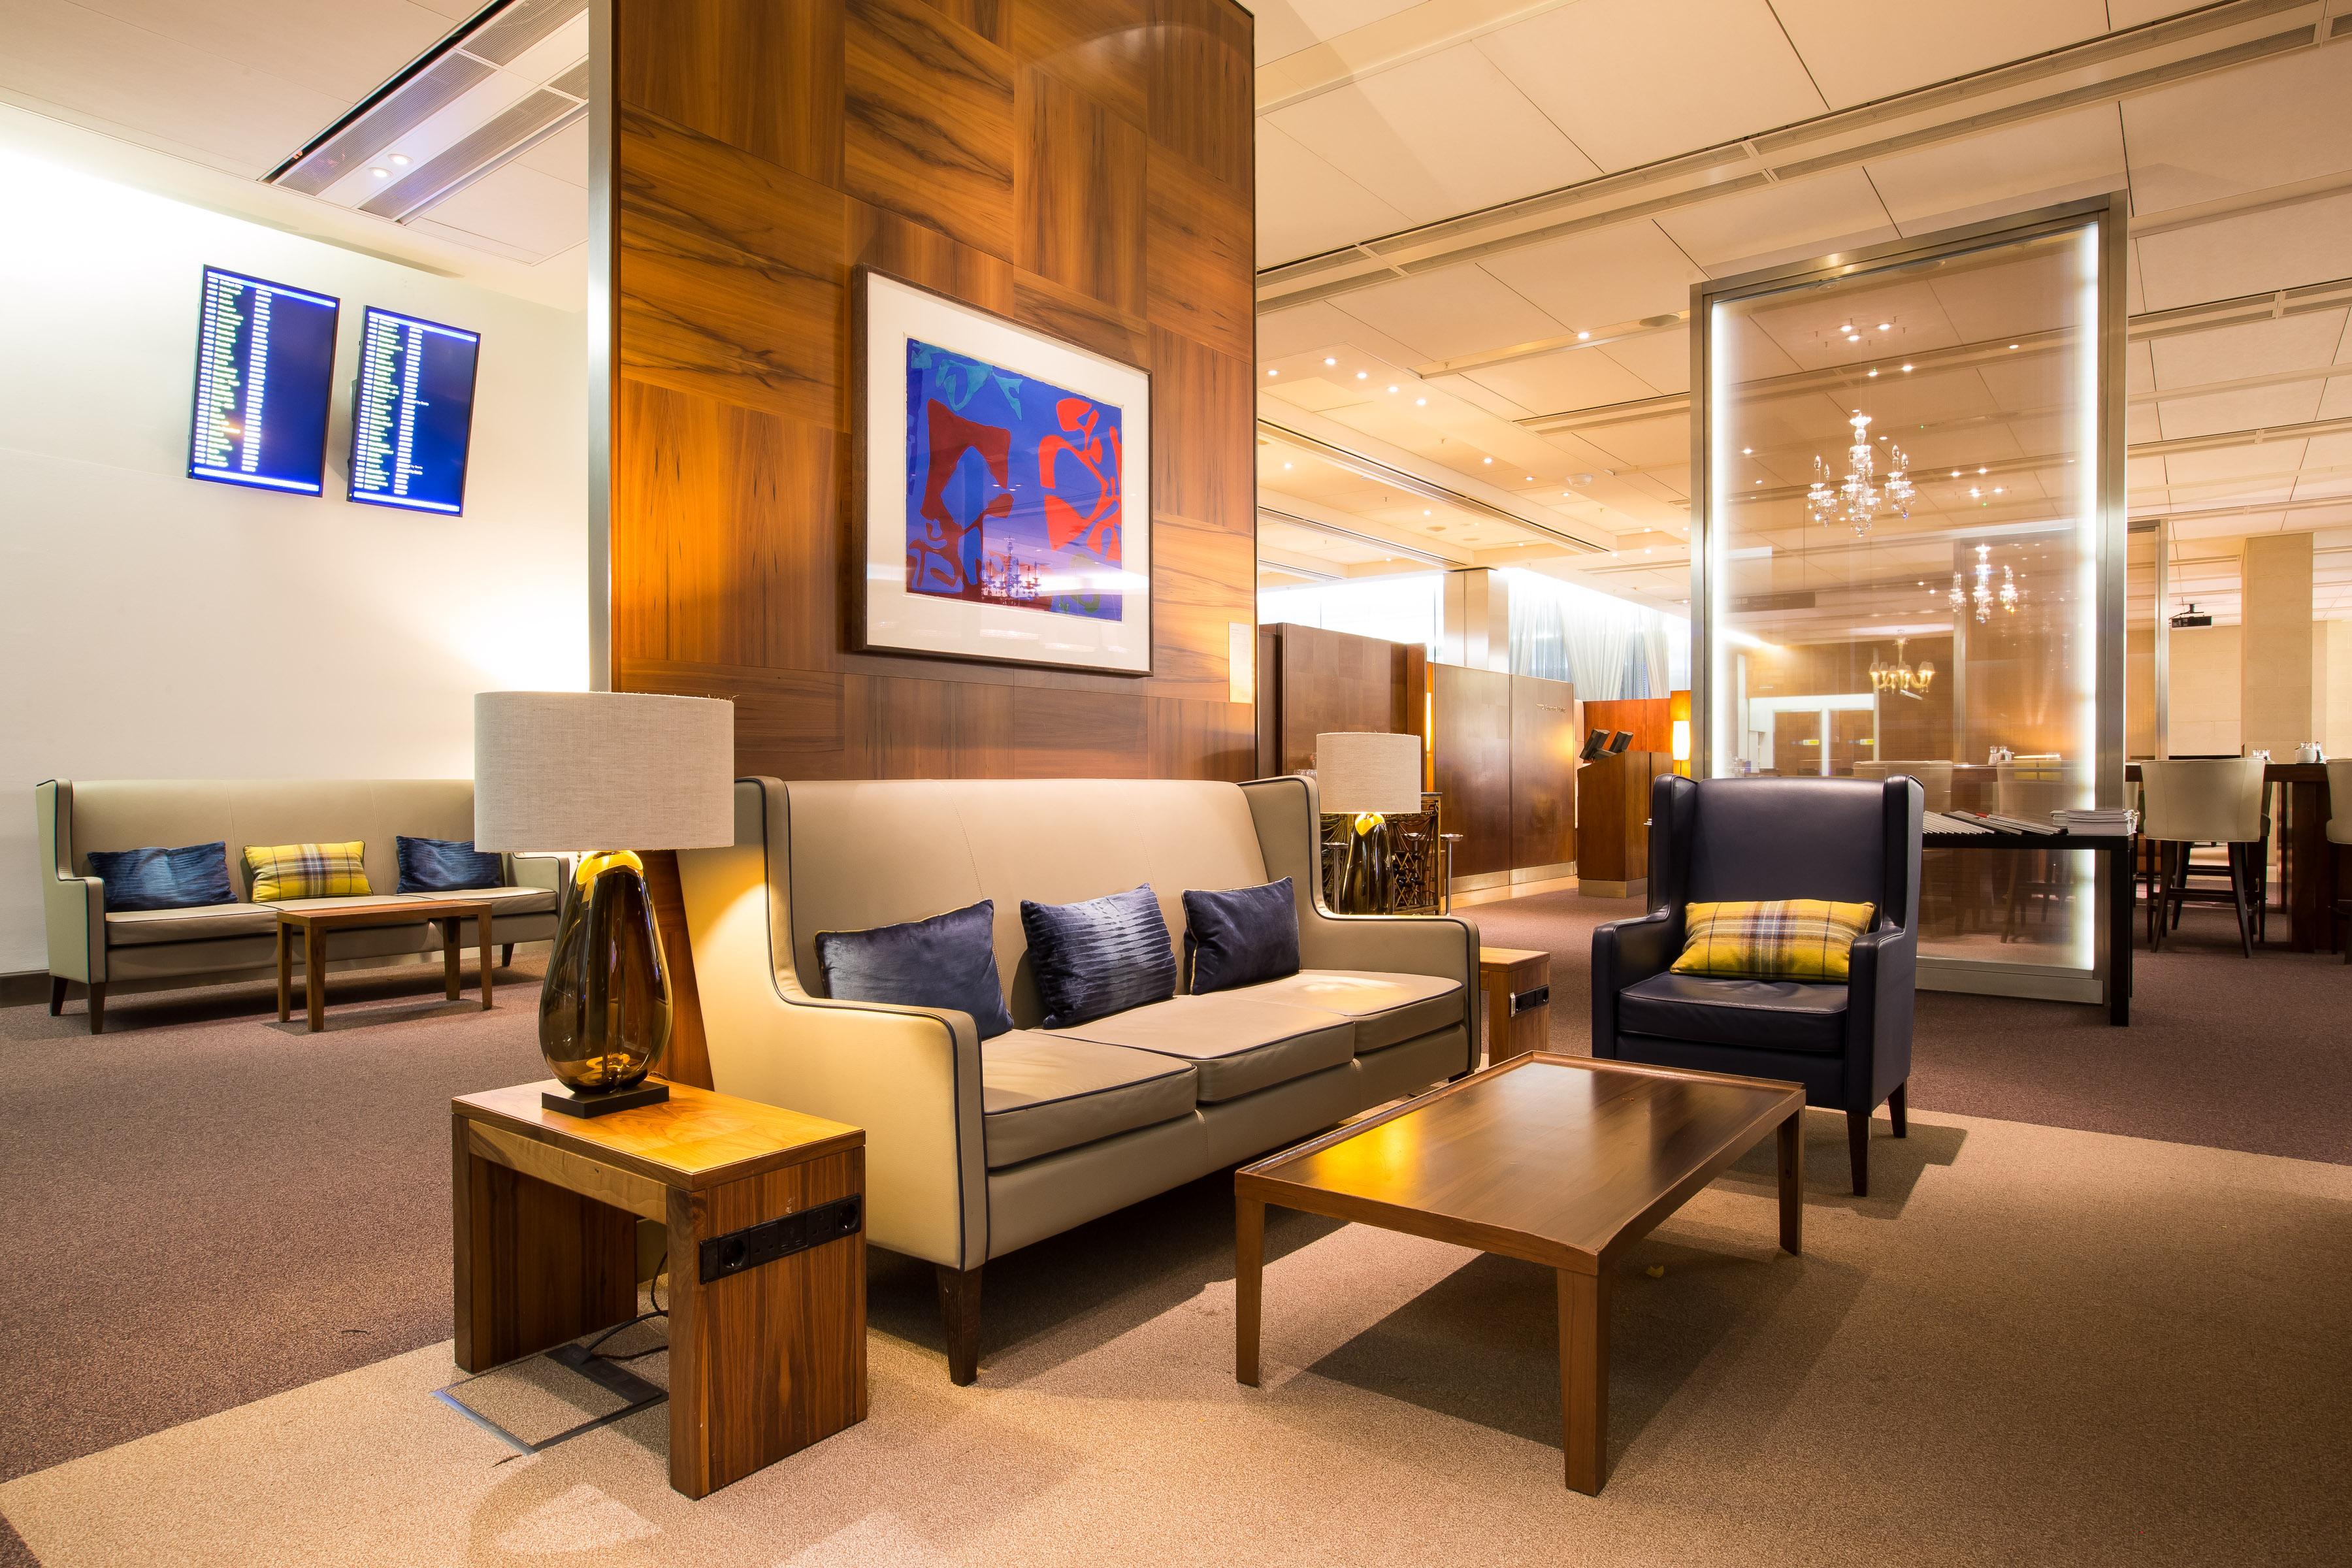 BA Concorde room lounge review T5 heathrow British Airways refurbished